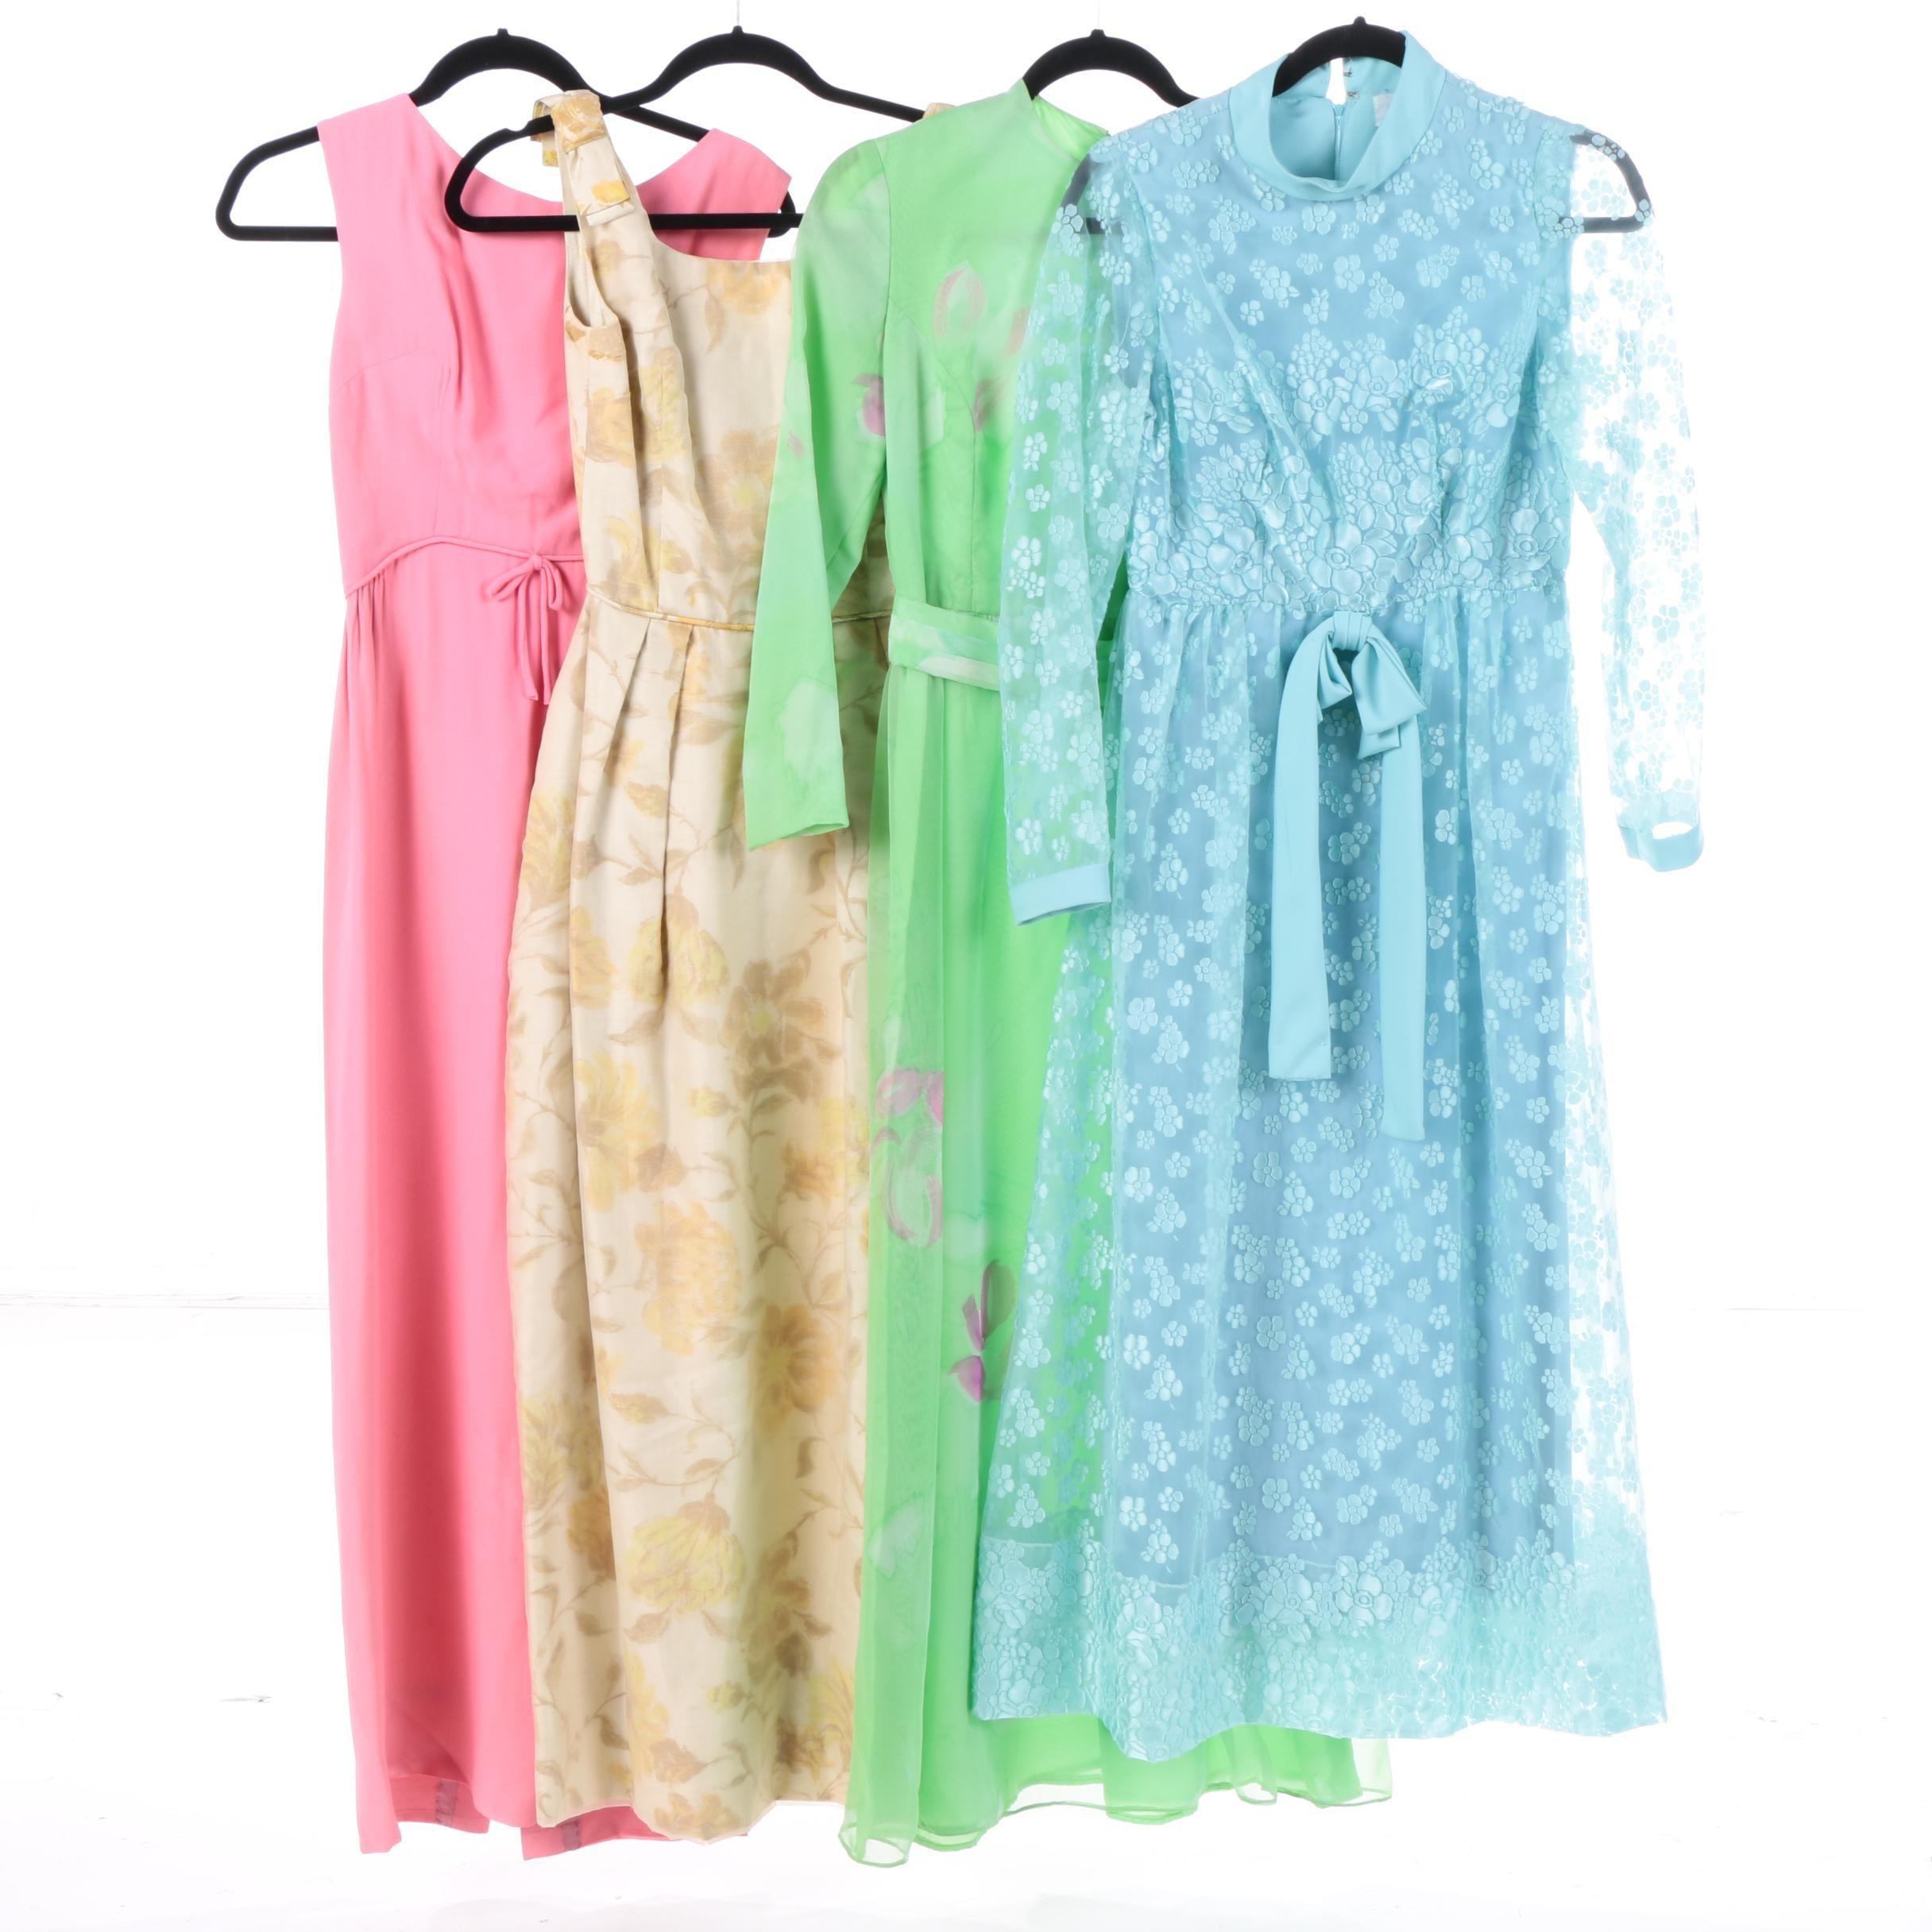 1960s Vintage Pastel Maxi Dresses Including Sakowitz